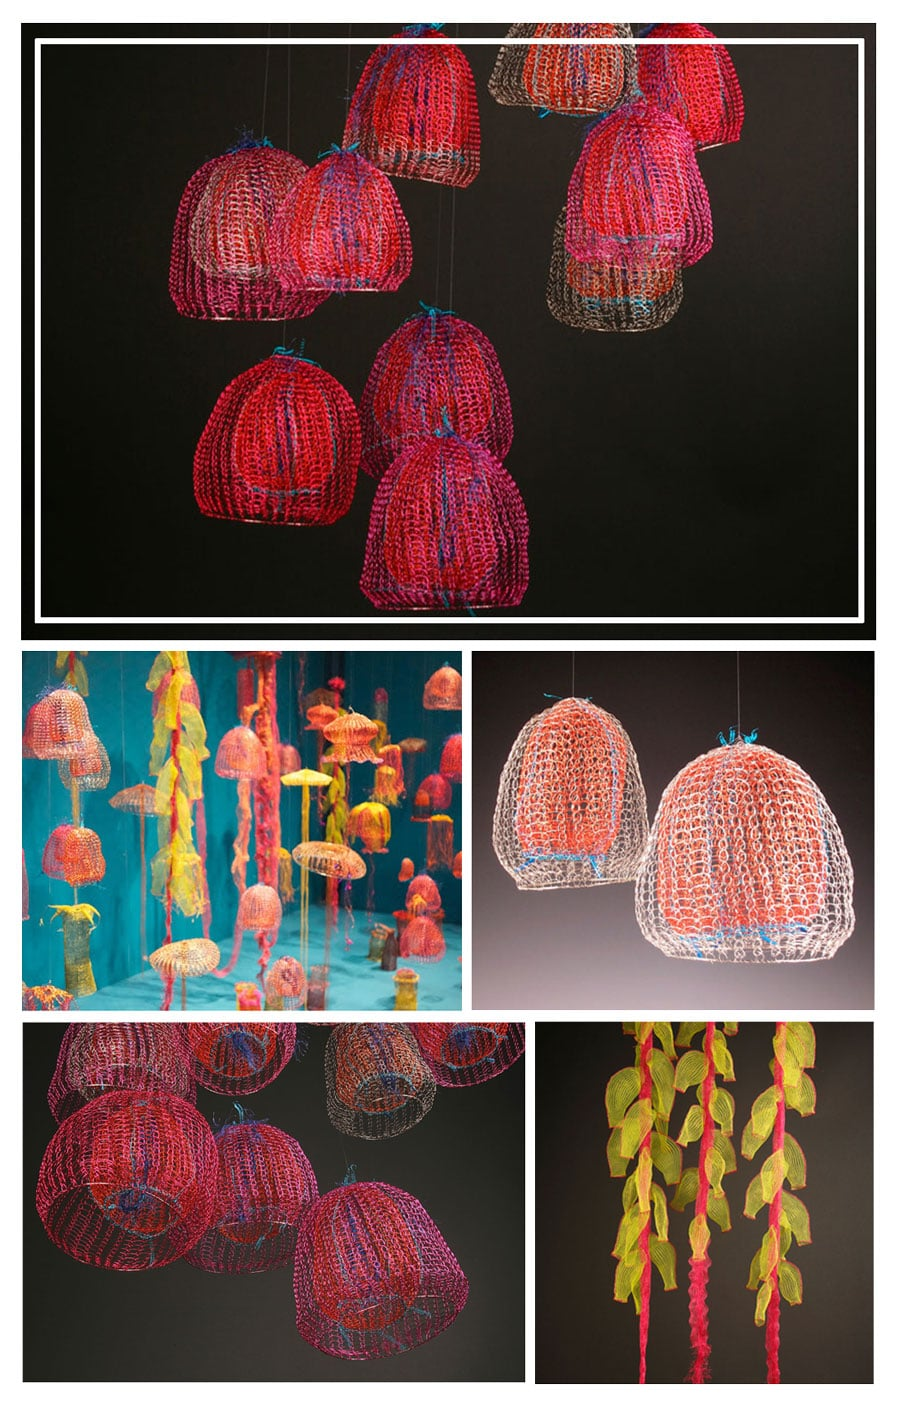 meduses art textile Arline Fisch